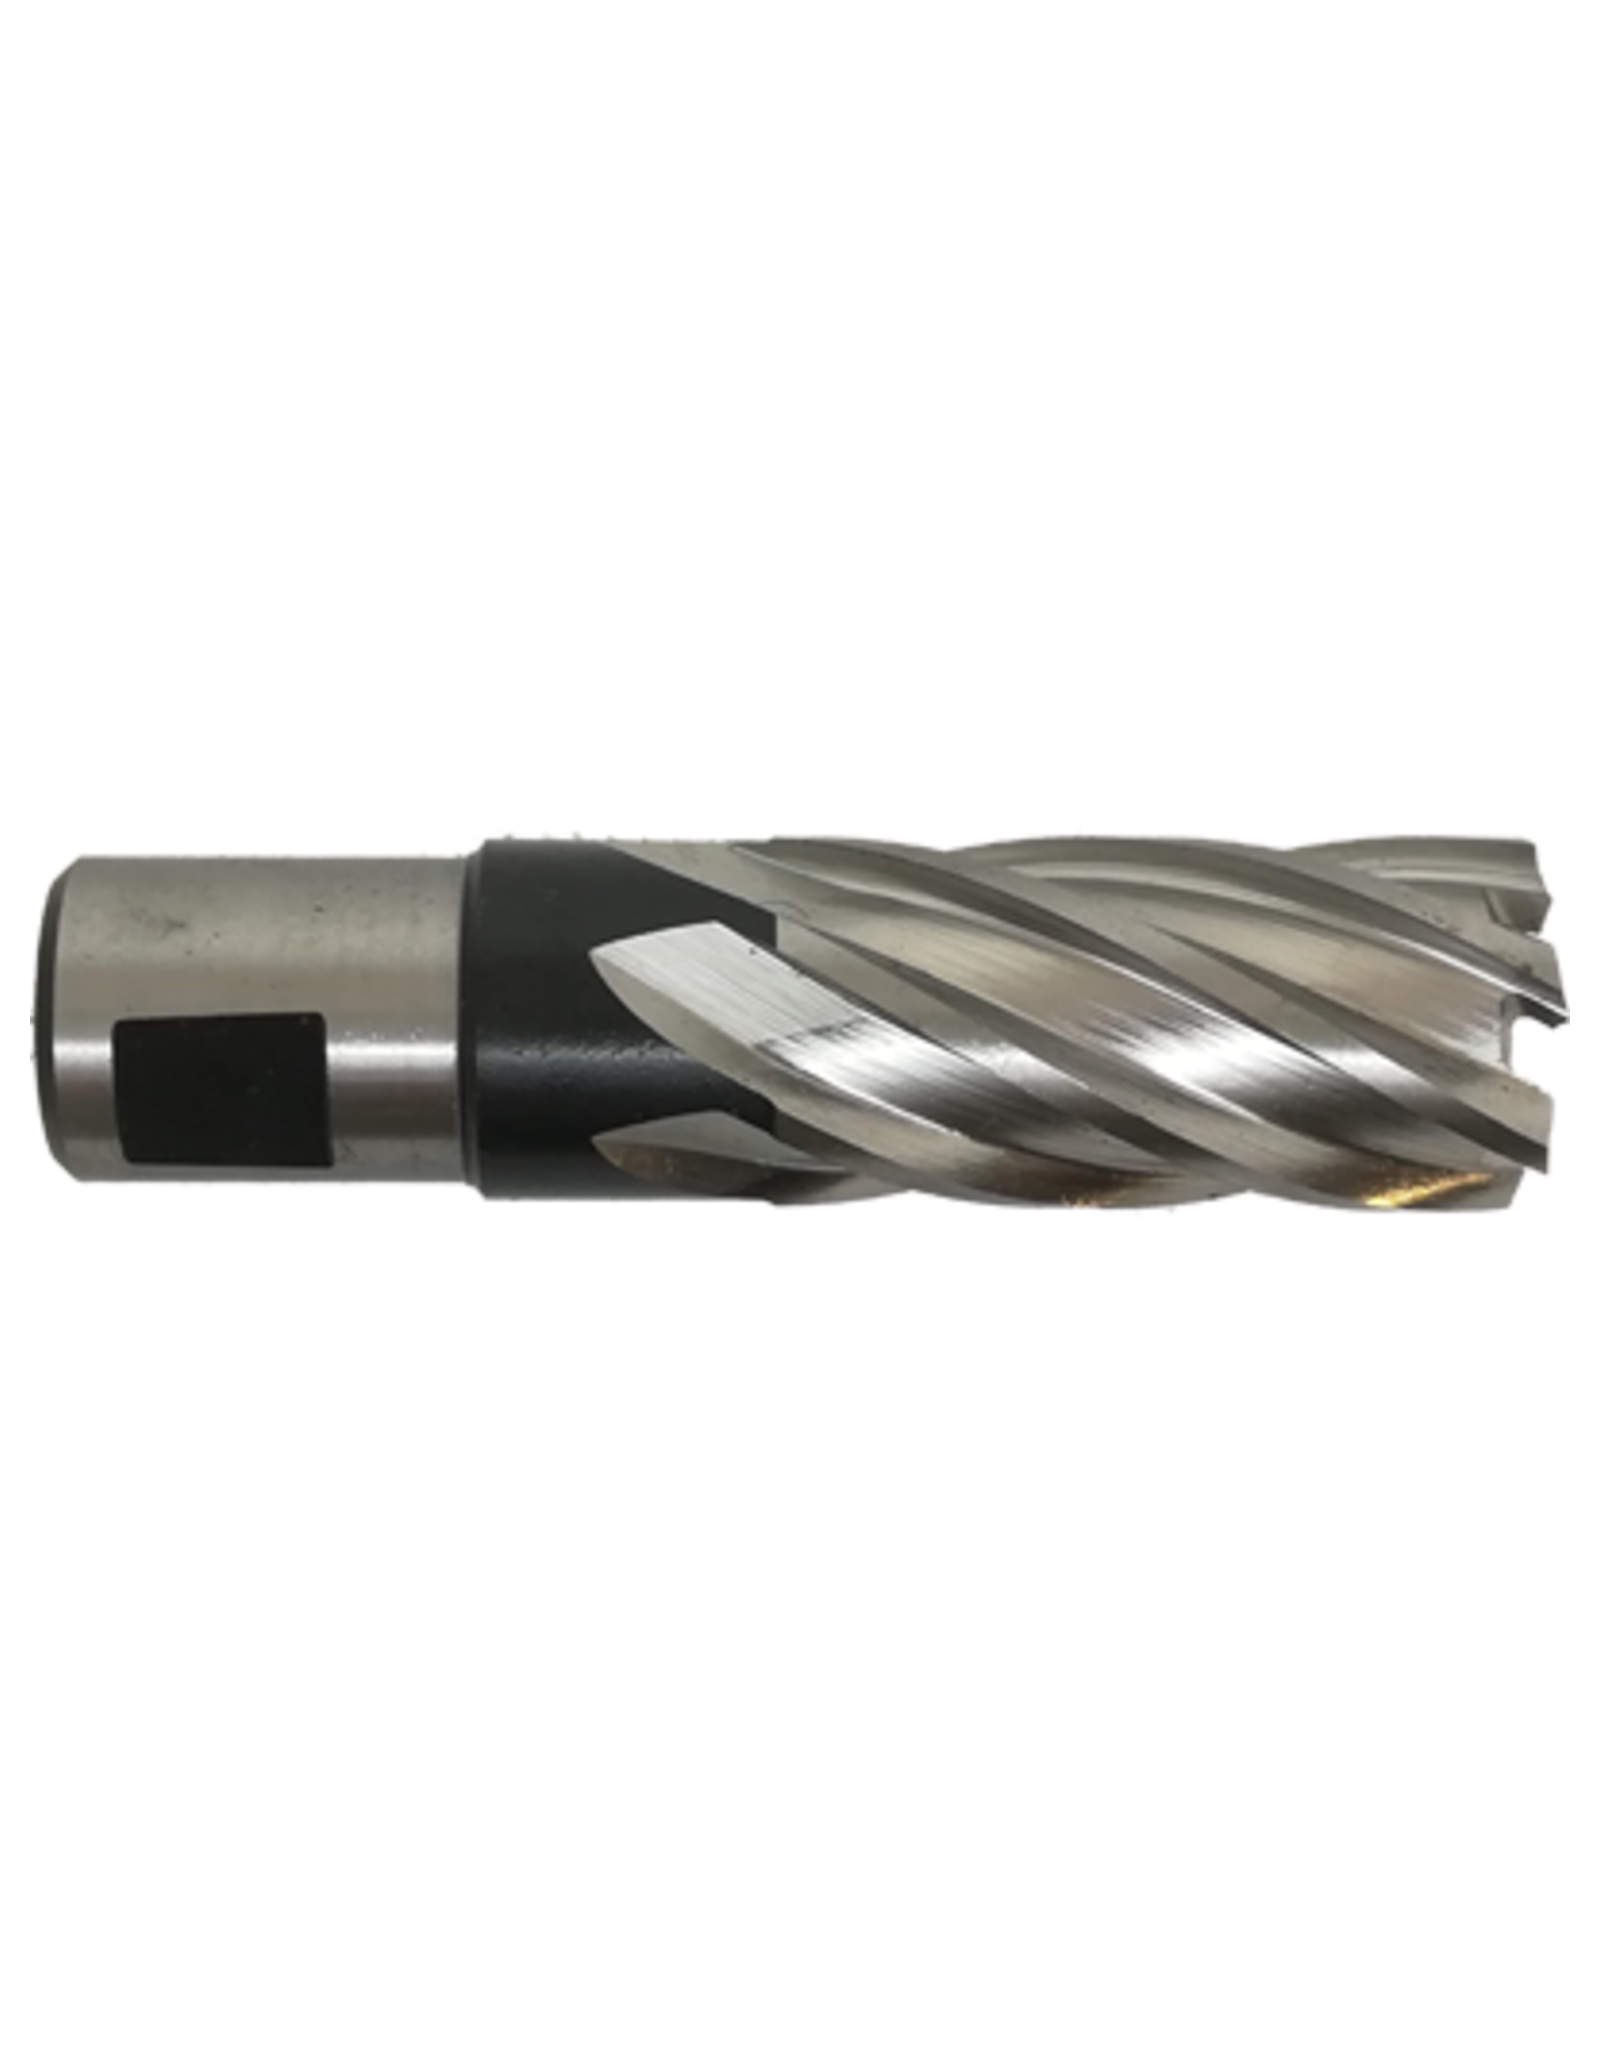 Evolution Power Tools Steel Line EVOLUTION CORE CUTTER LONG - 16 MM